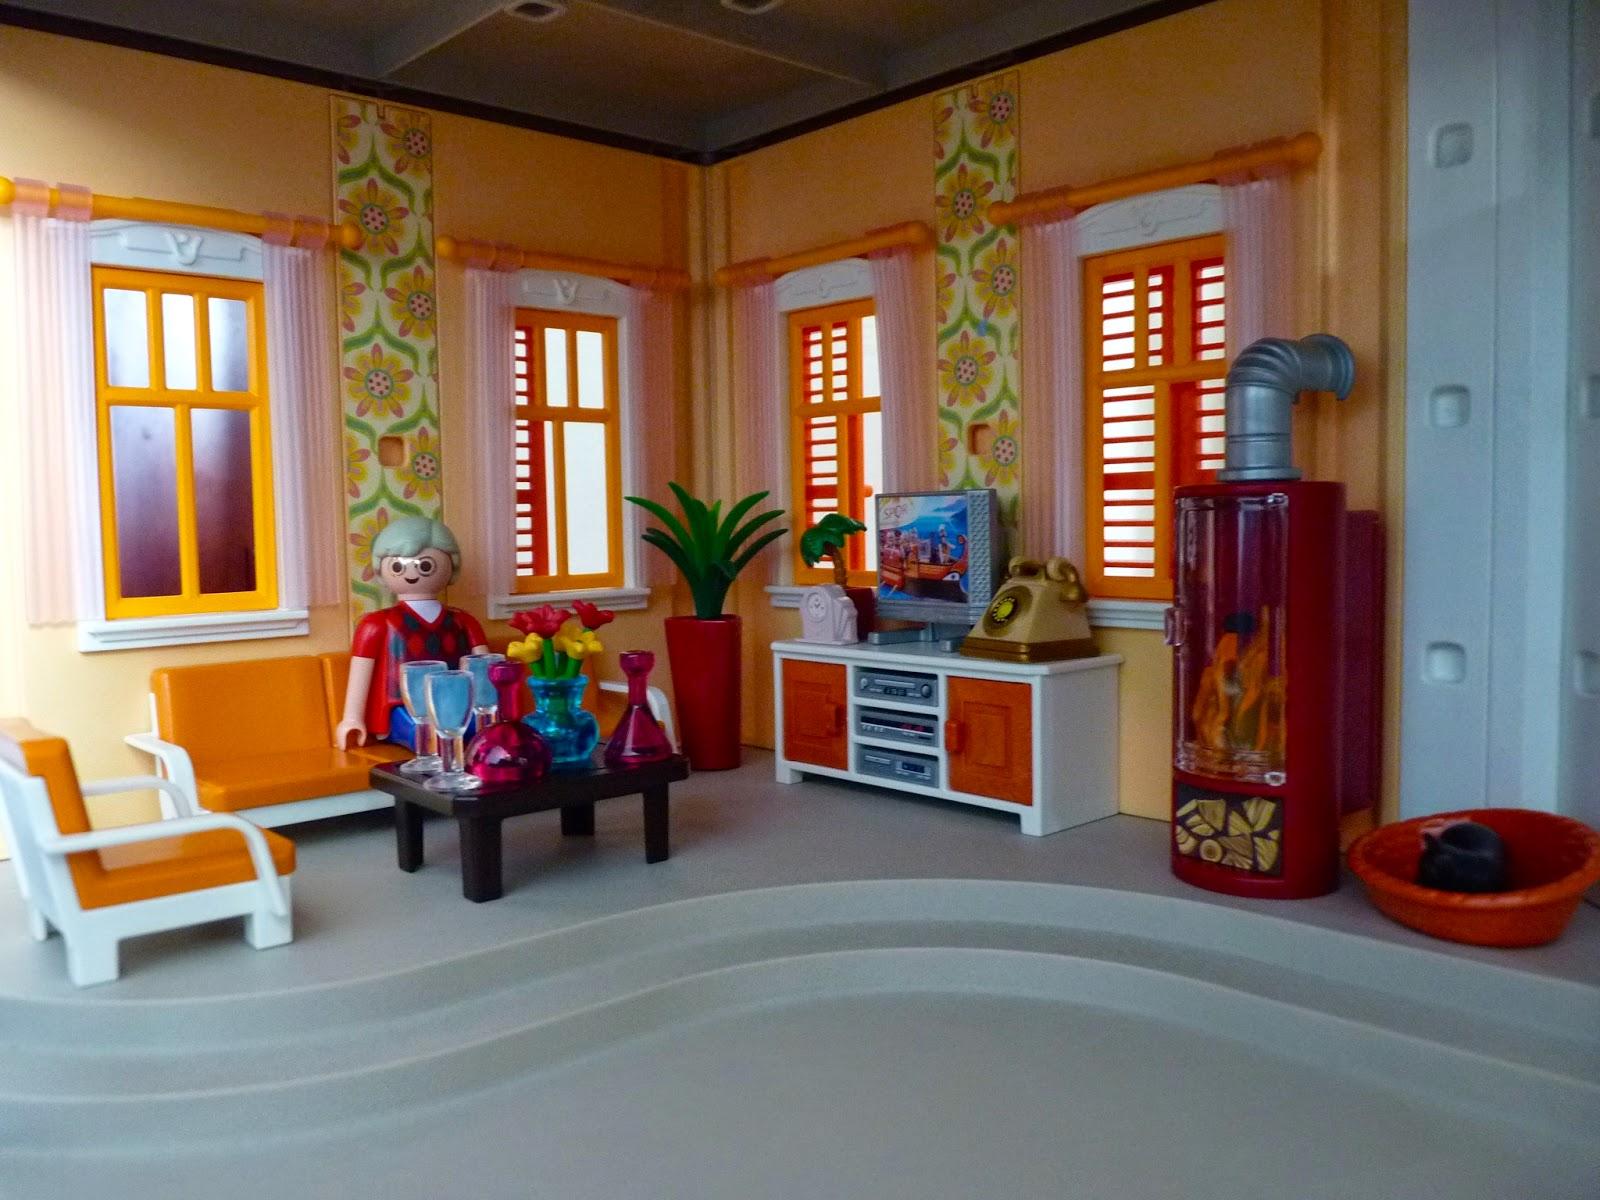 Playmobil 5332 sophia playmobil - Playmobil wohnzimmer 5332 ...